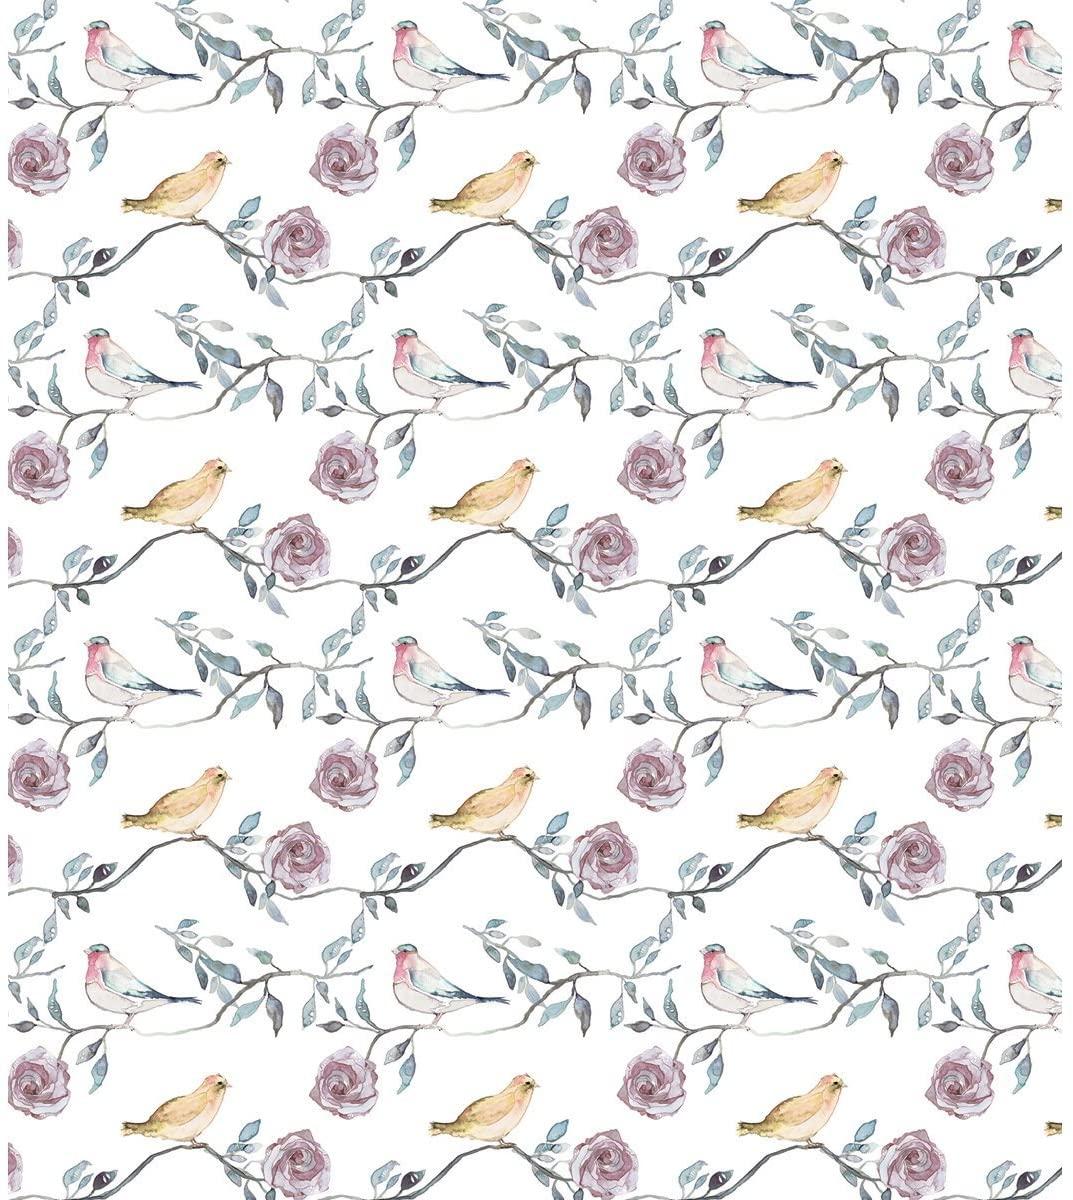 Craft Consortium Bird Tree Tops Decoupage Papers (3 Pack), 13.75 x 15.75